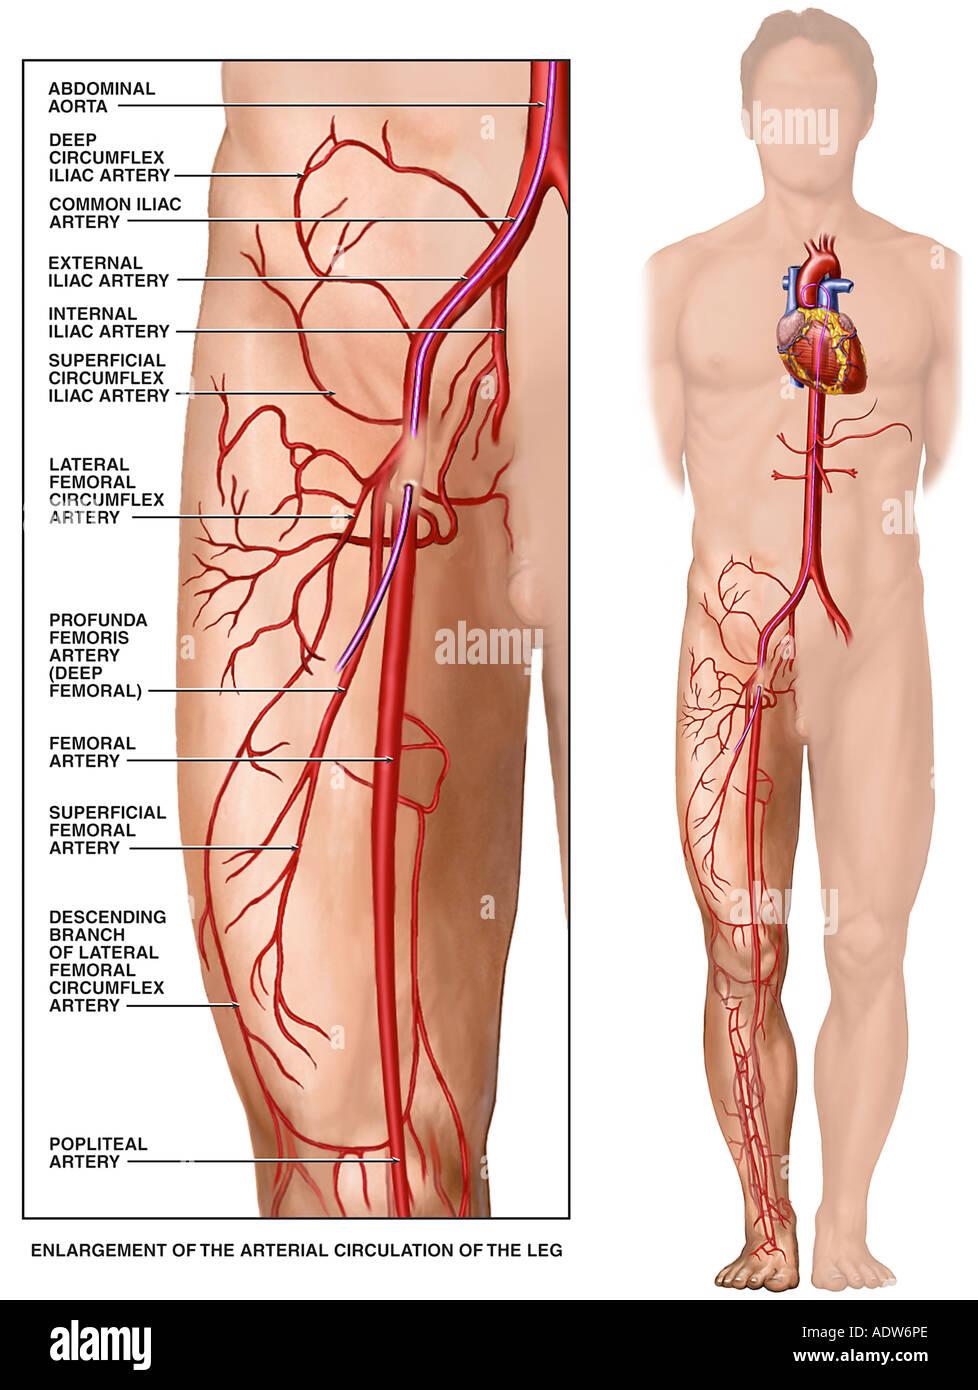 Cardiac Circulatory Catheter Stock Photos & Cardiac Circulatory ...